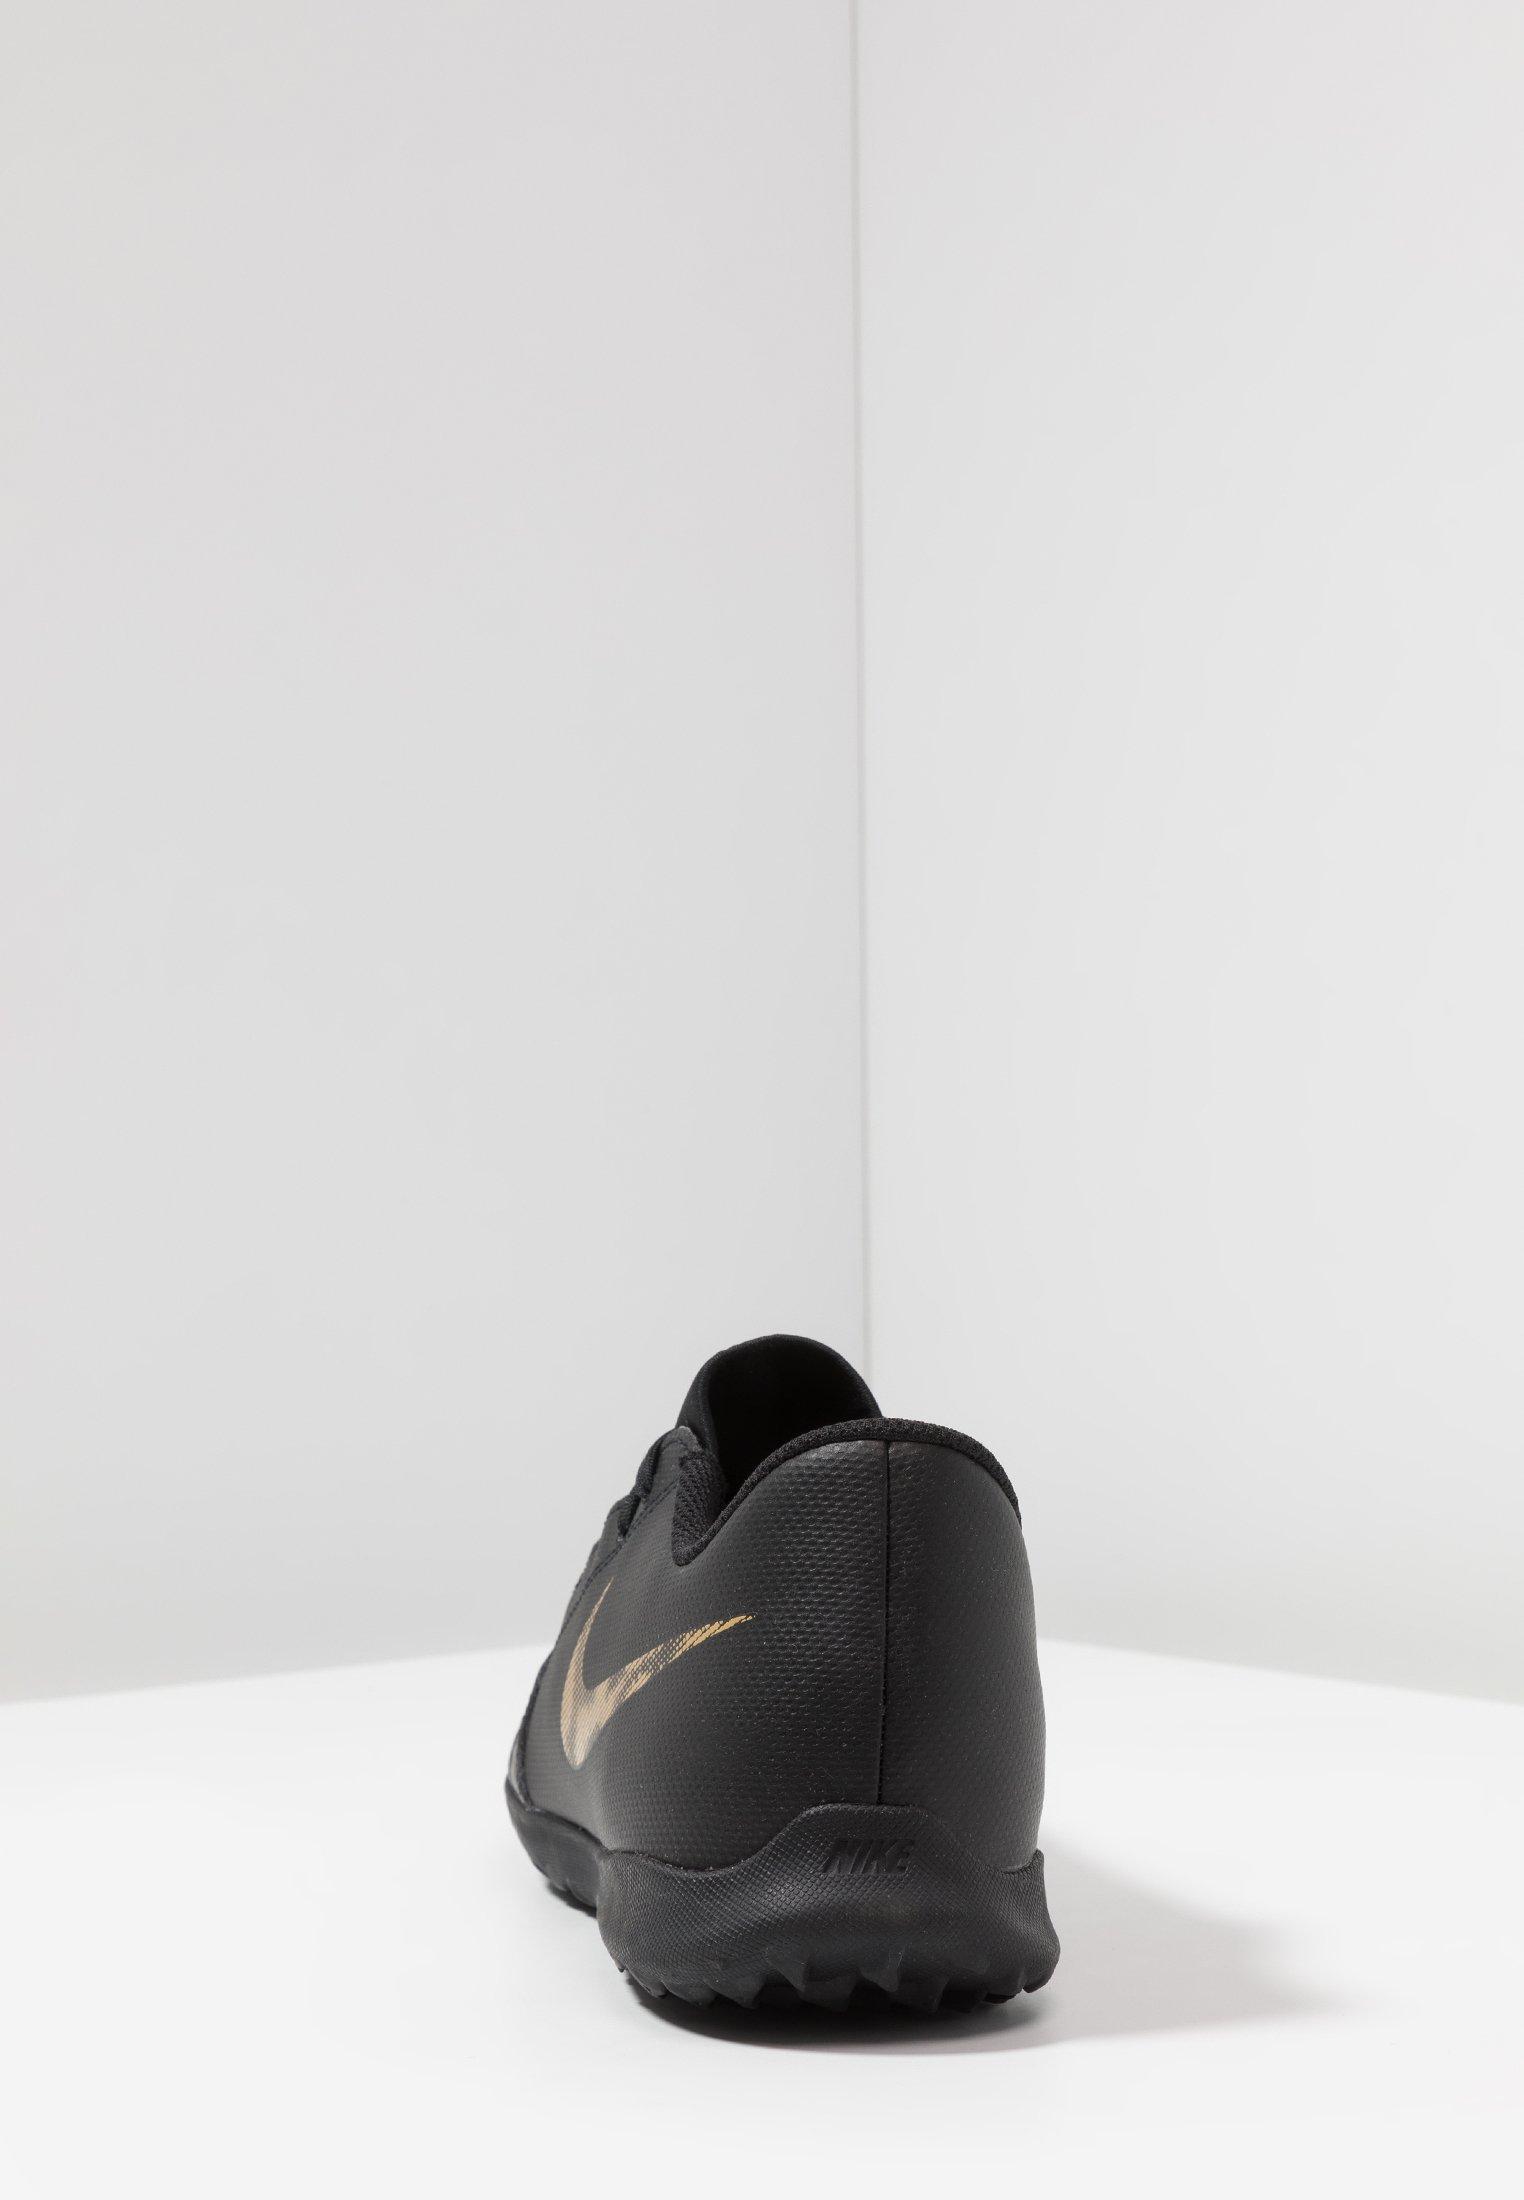 PHANTOM CLUB TF Chaussures de foot multicrampons blackmetallic vivid gold